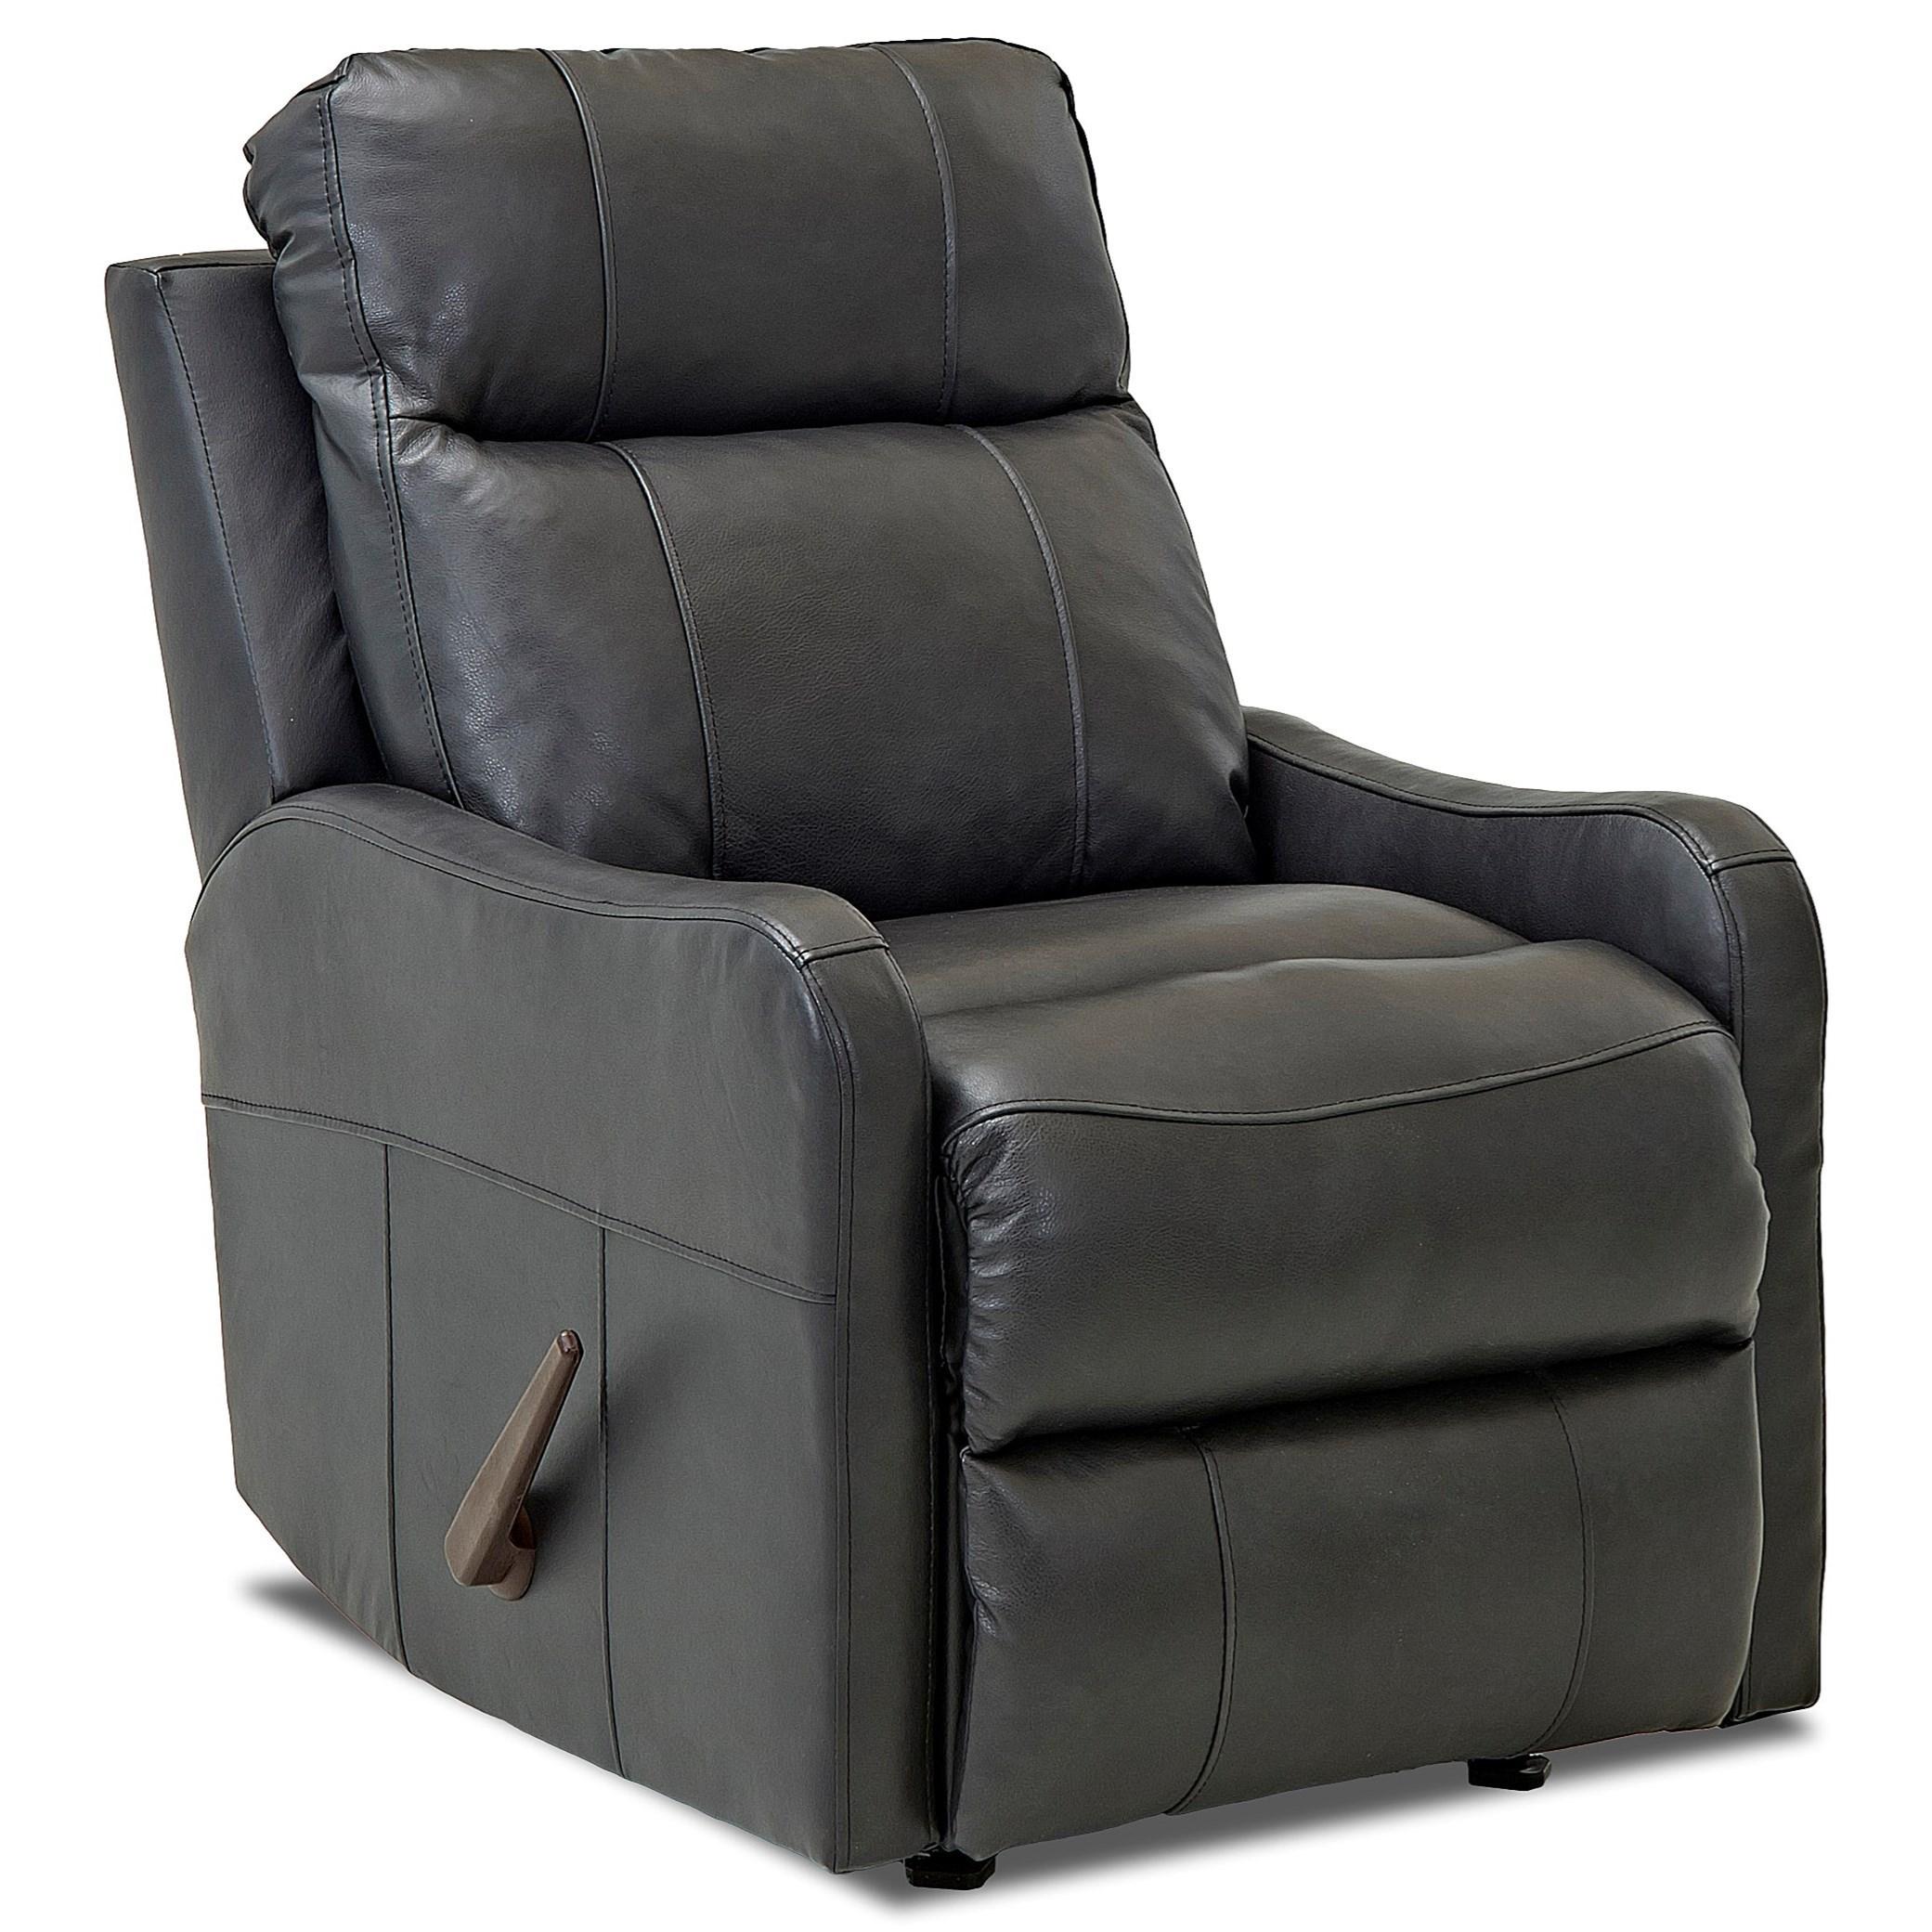 Casual Gliding Reclining Chair